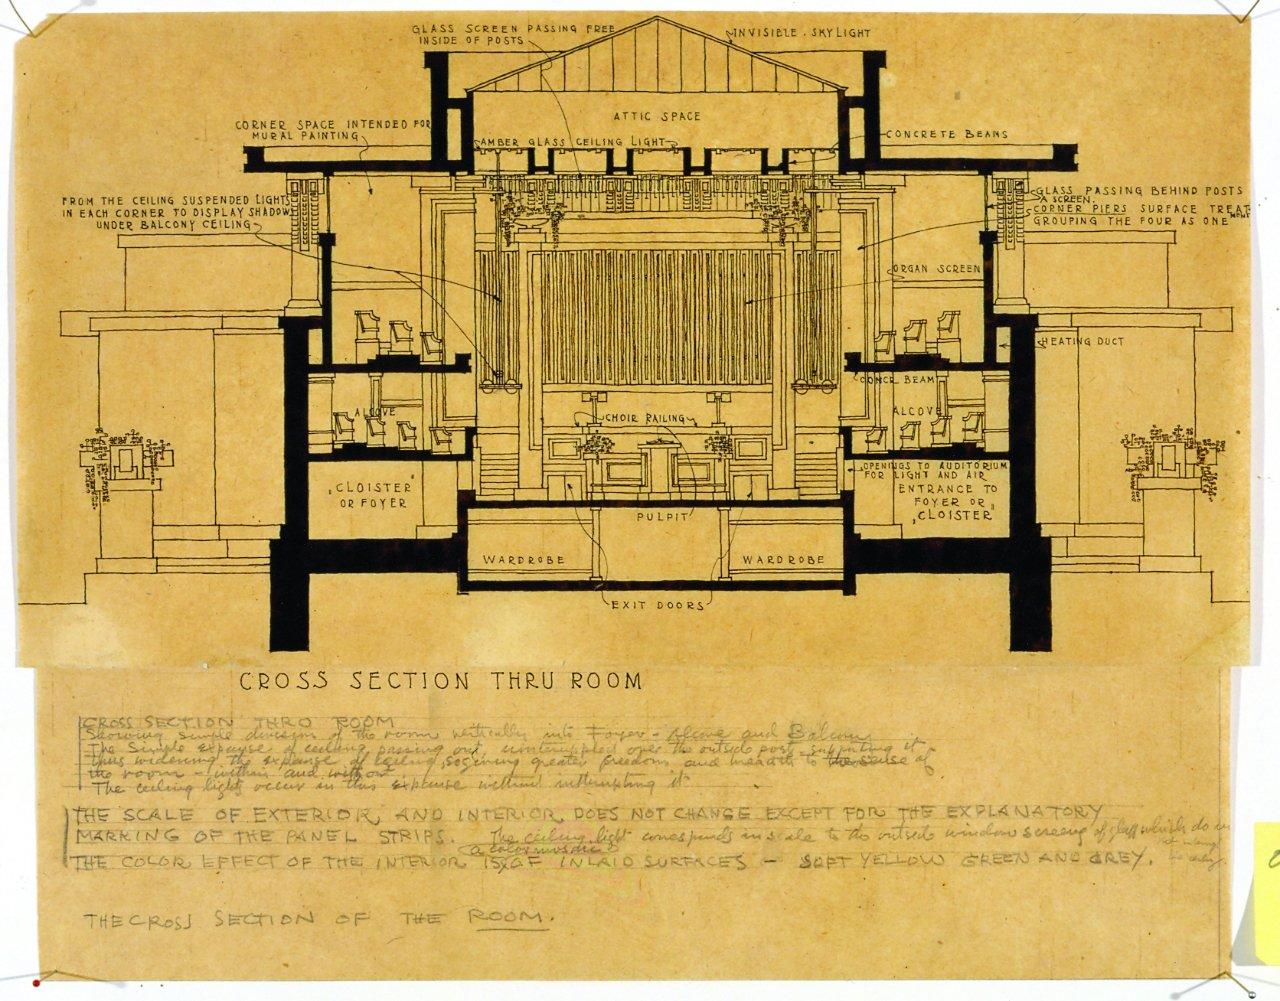 Frank Lloyd Wright, Templo Unitario, Oak Park, Illinois, 1905-08 © 2010 Frank Lloyd Wright Foundation, Scottsdale, Arizona